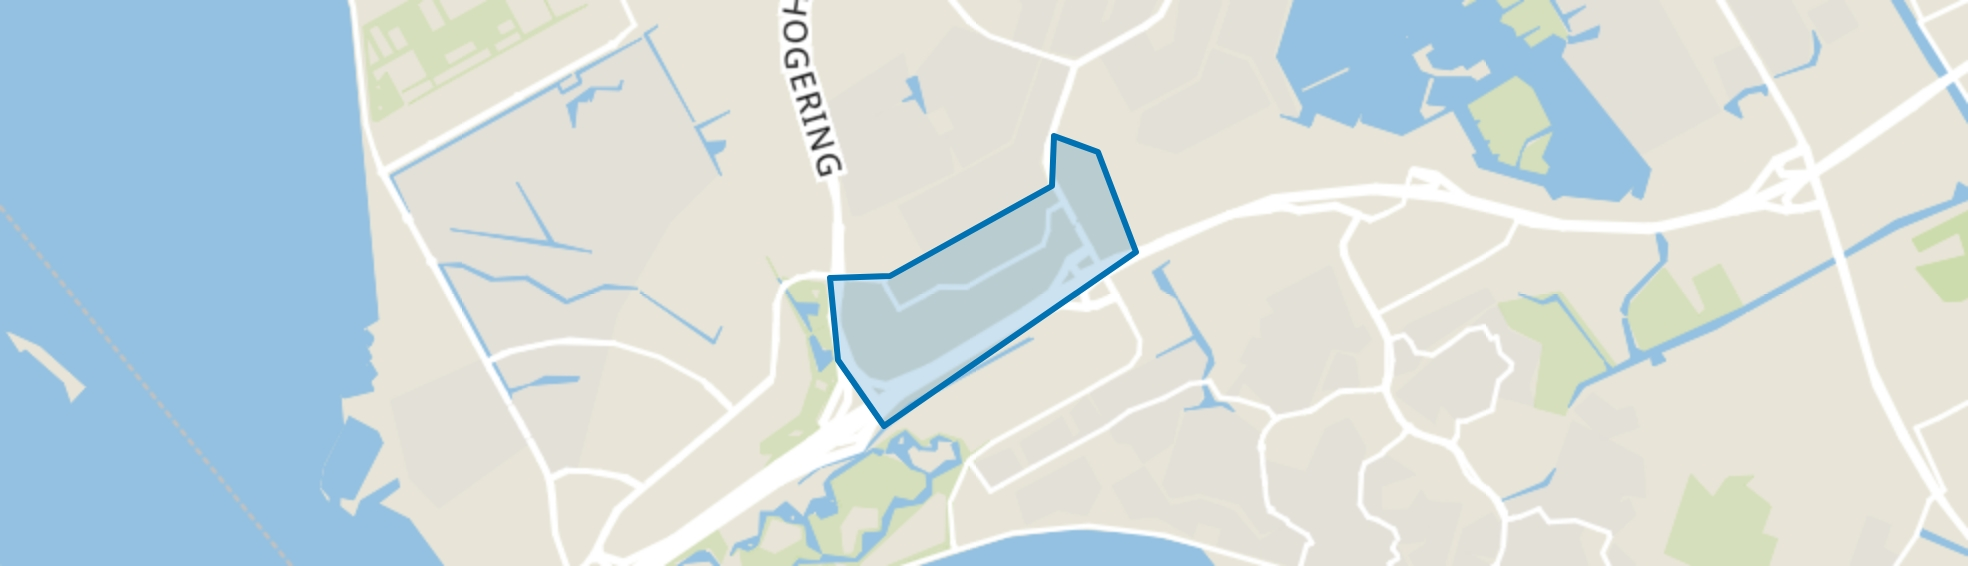 Gooisekant, Almere map